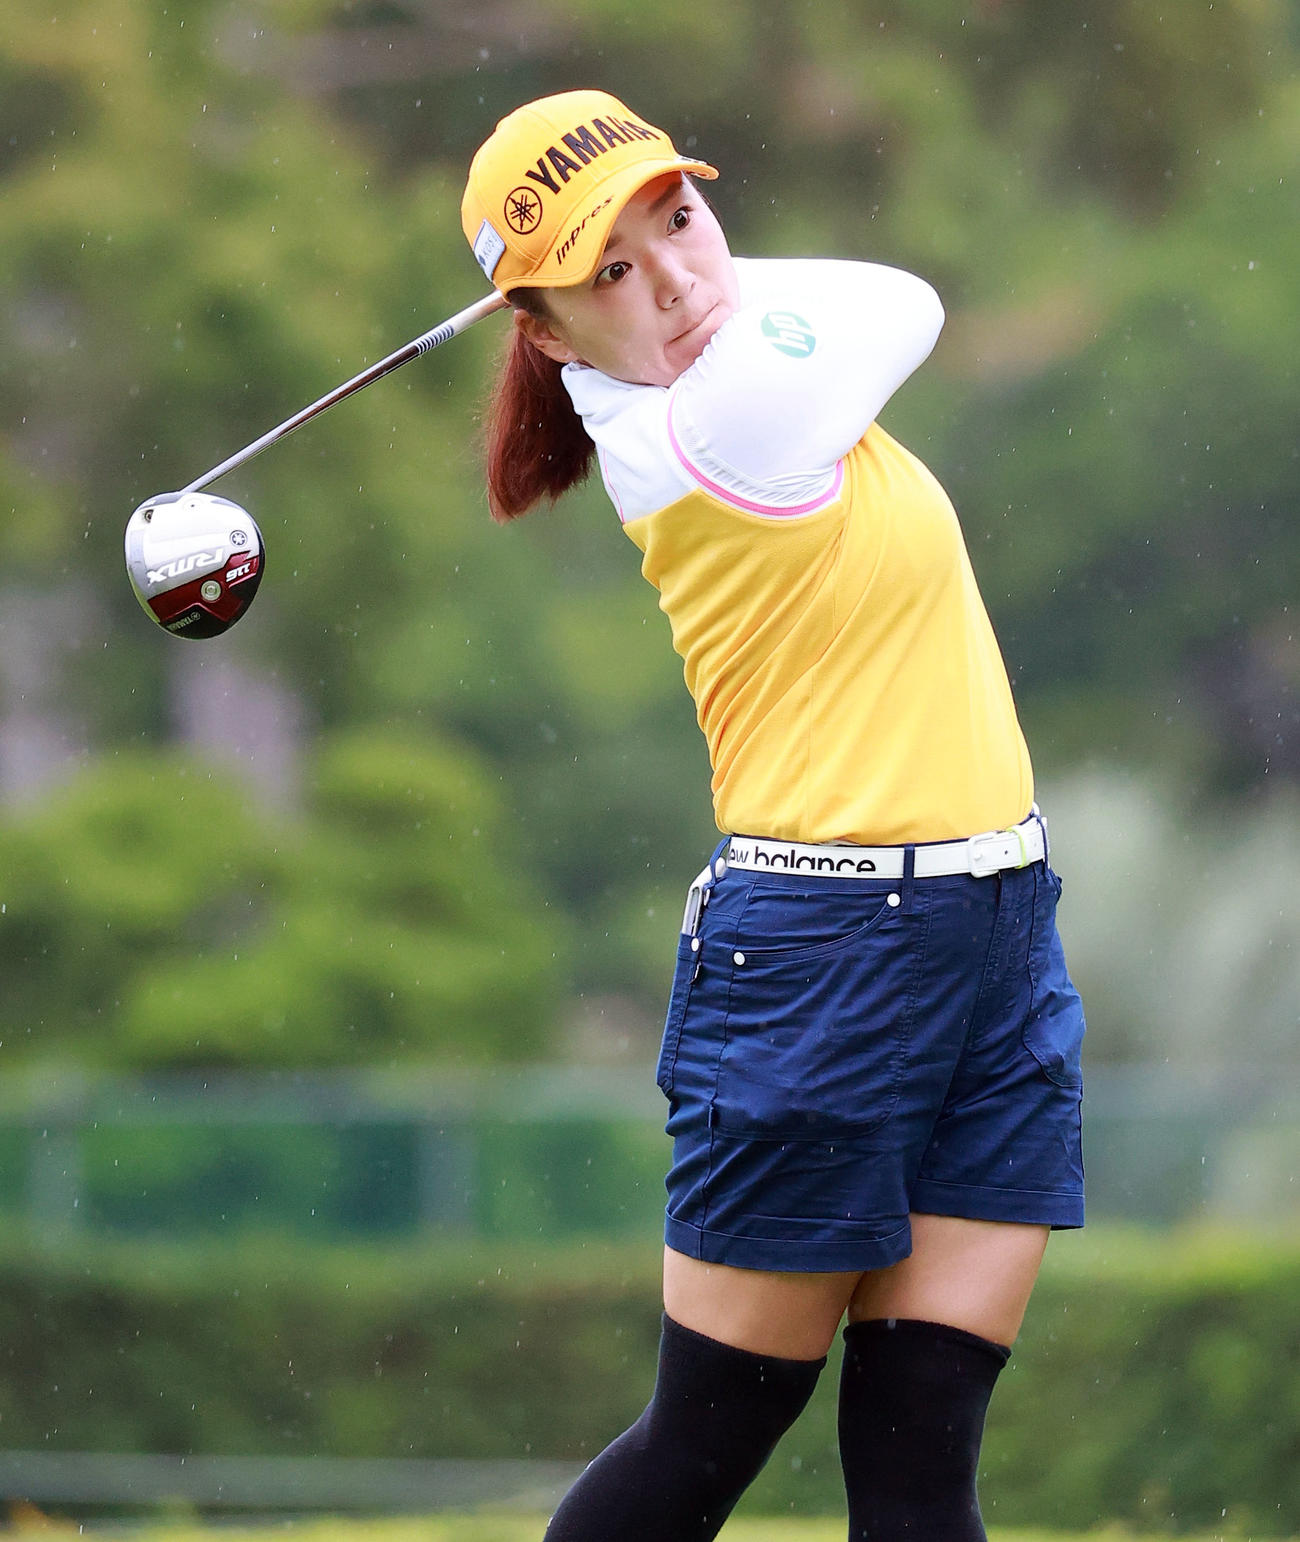 https://www.nikkansports.com/sports/golf/news/img/202106190000159-w1300_8.jpg